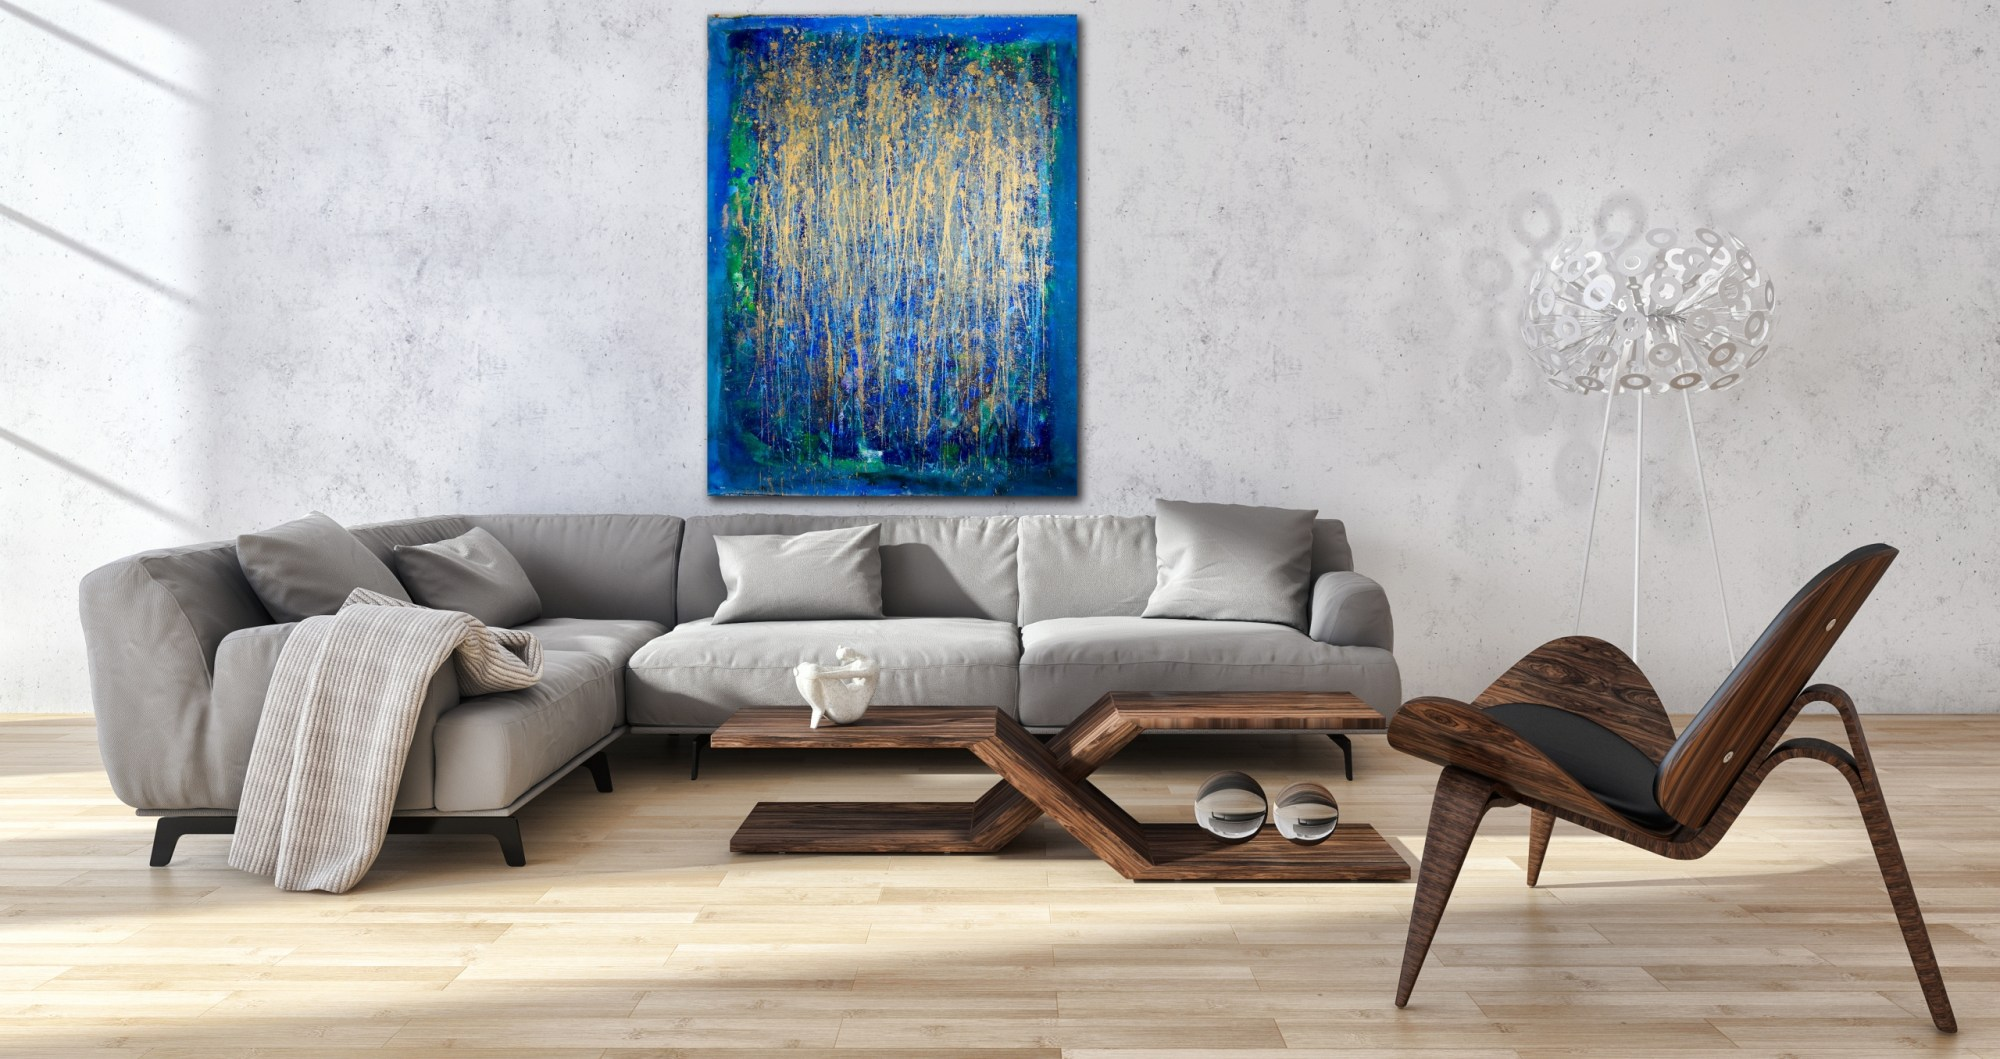 Drizzles 3 (2016) Mixed Media painting by Nestor Toro